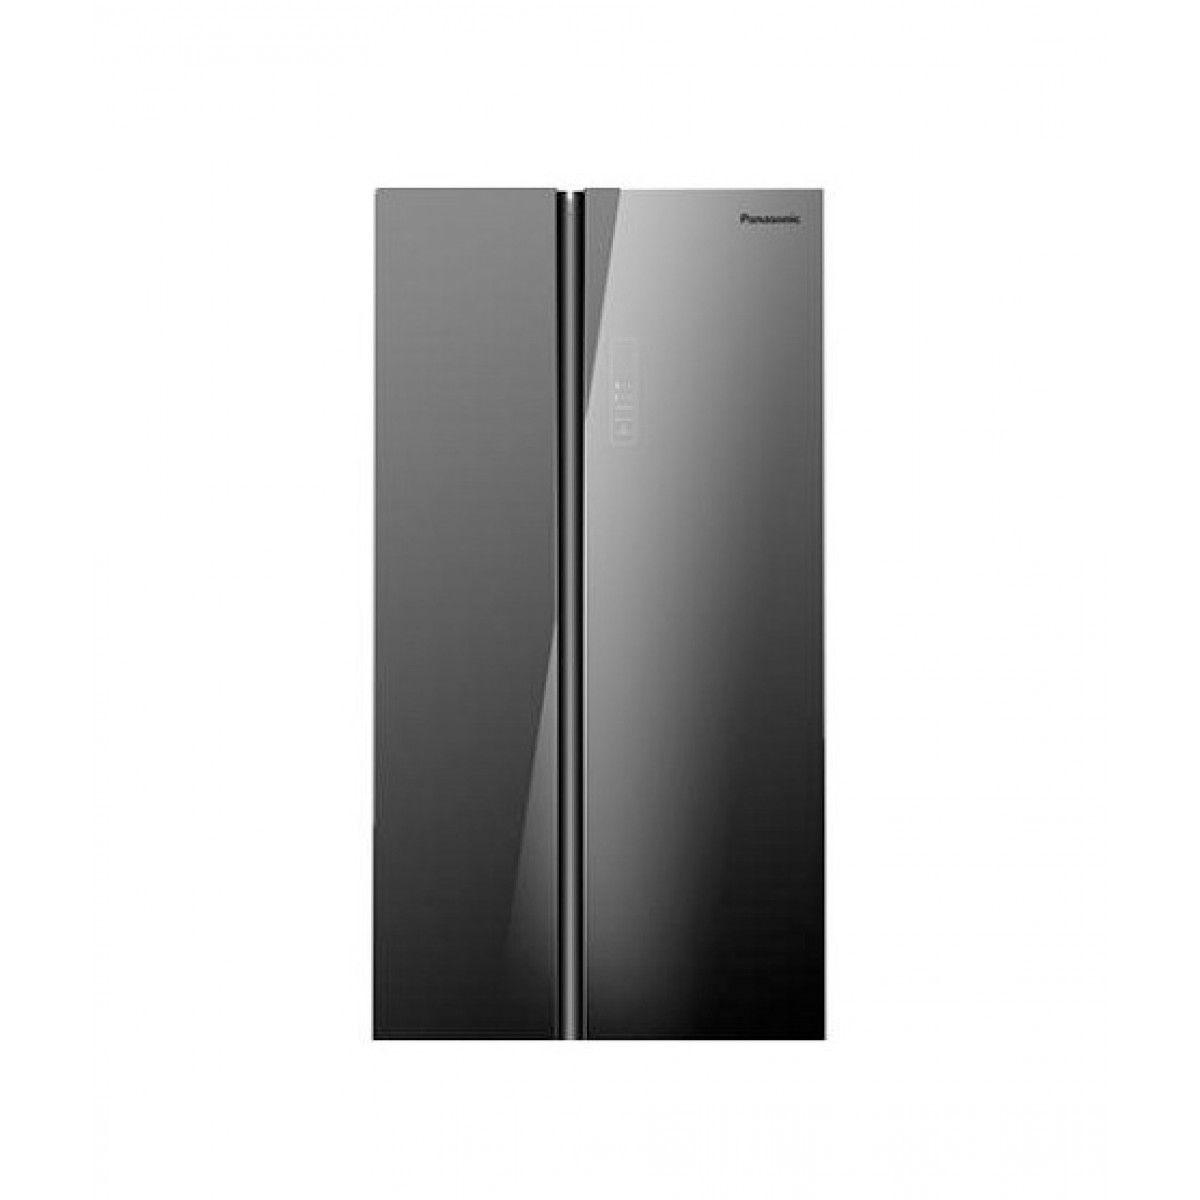 Panasonic Side-By-Side Refrigerator 700L (NR-BS701)